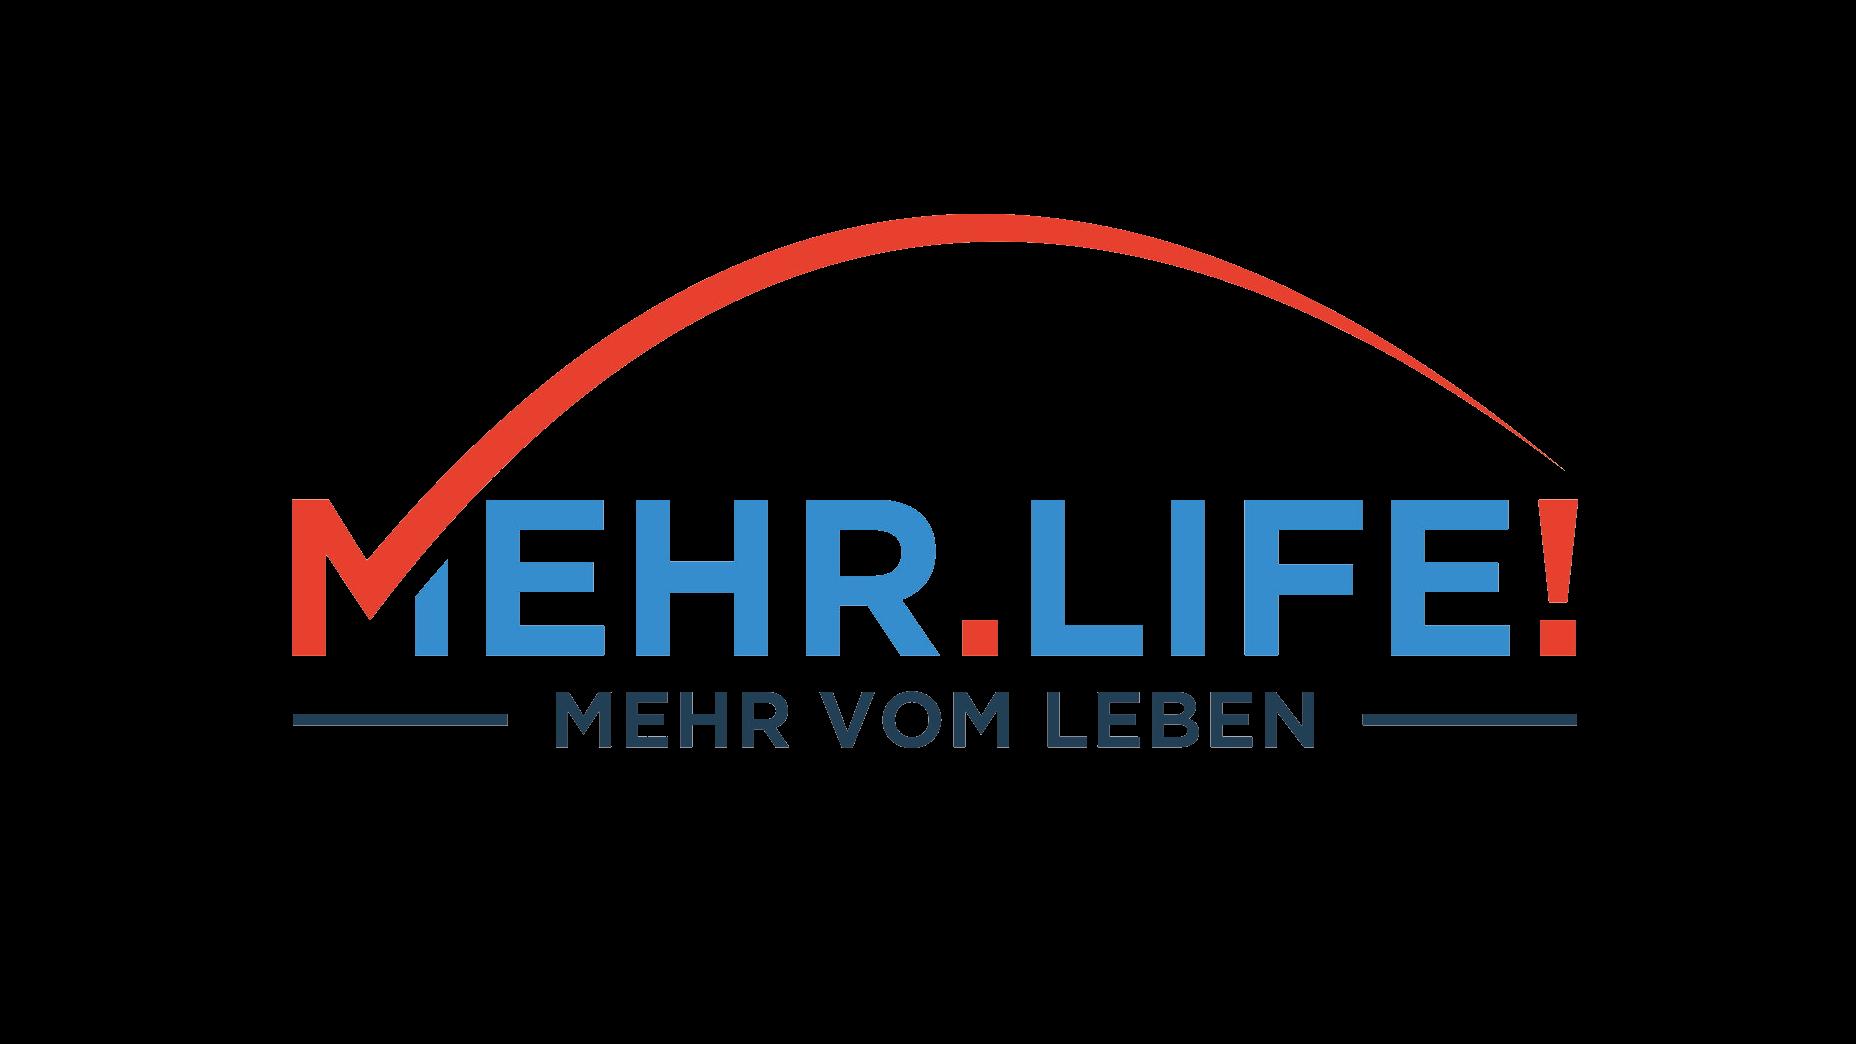 Mehr.Life!